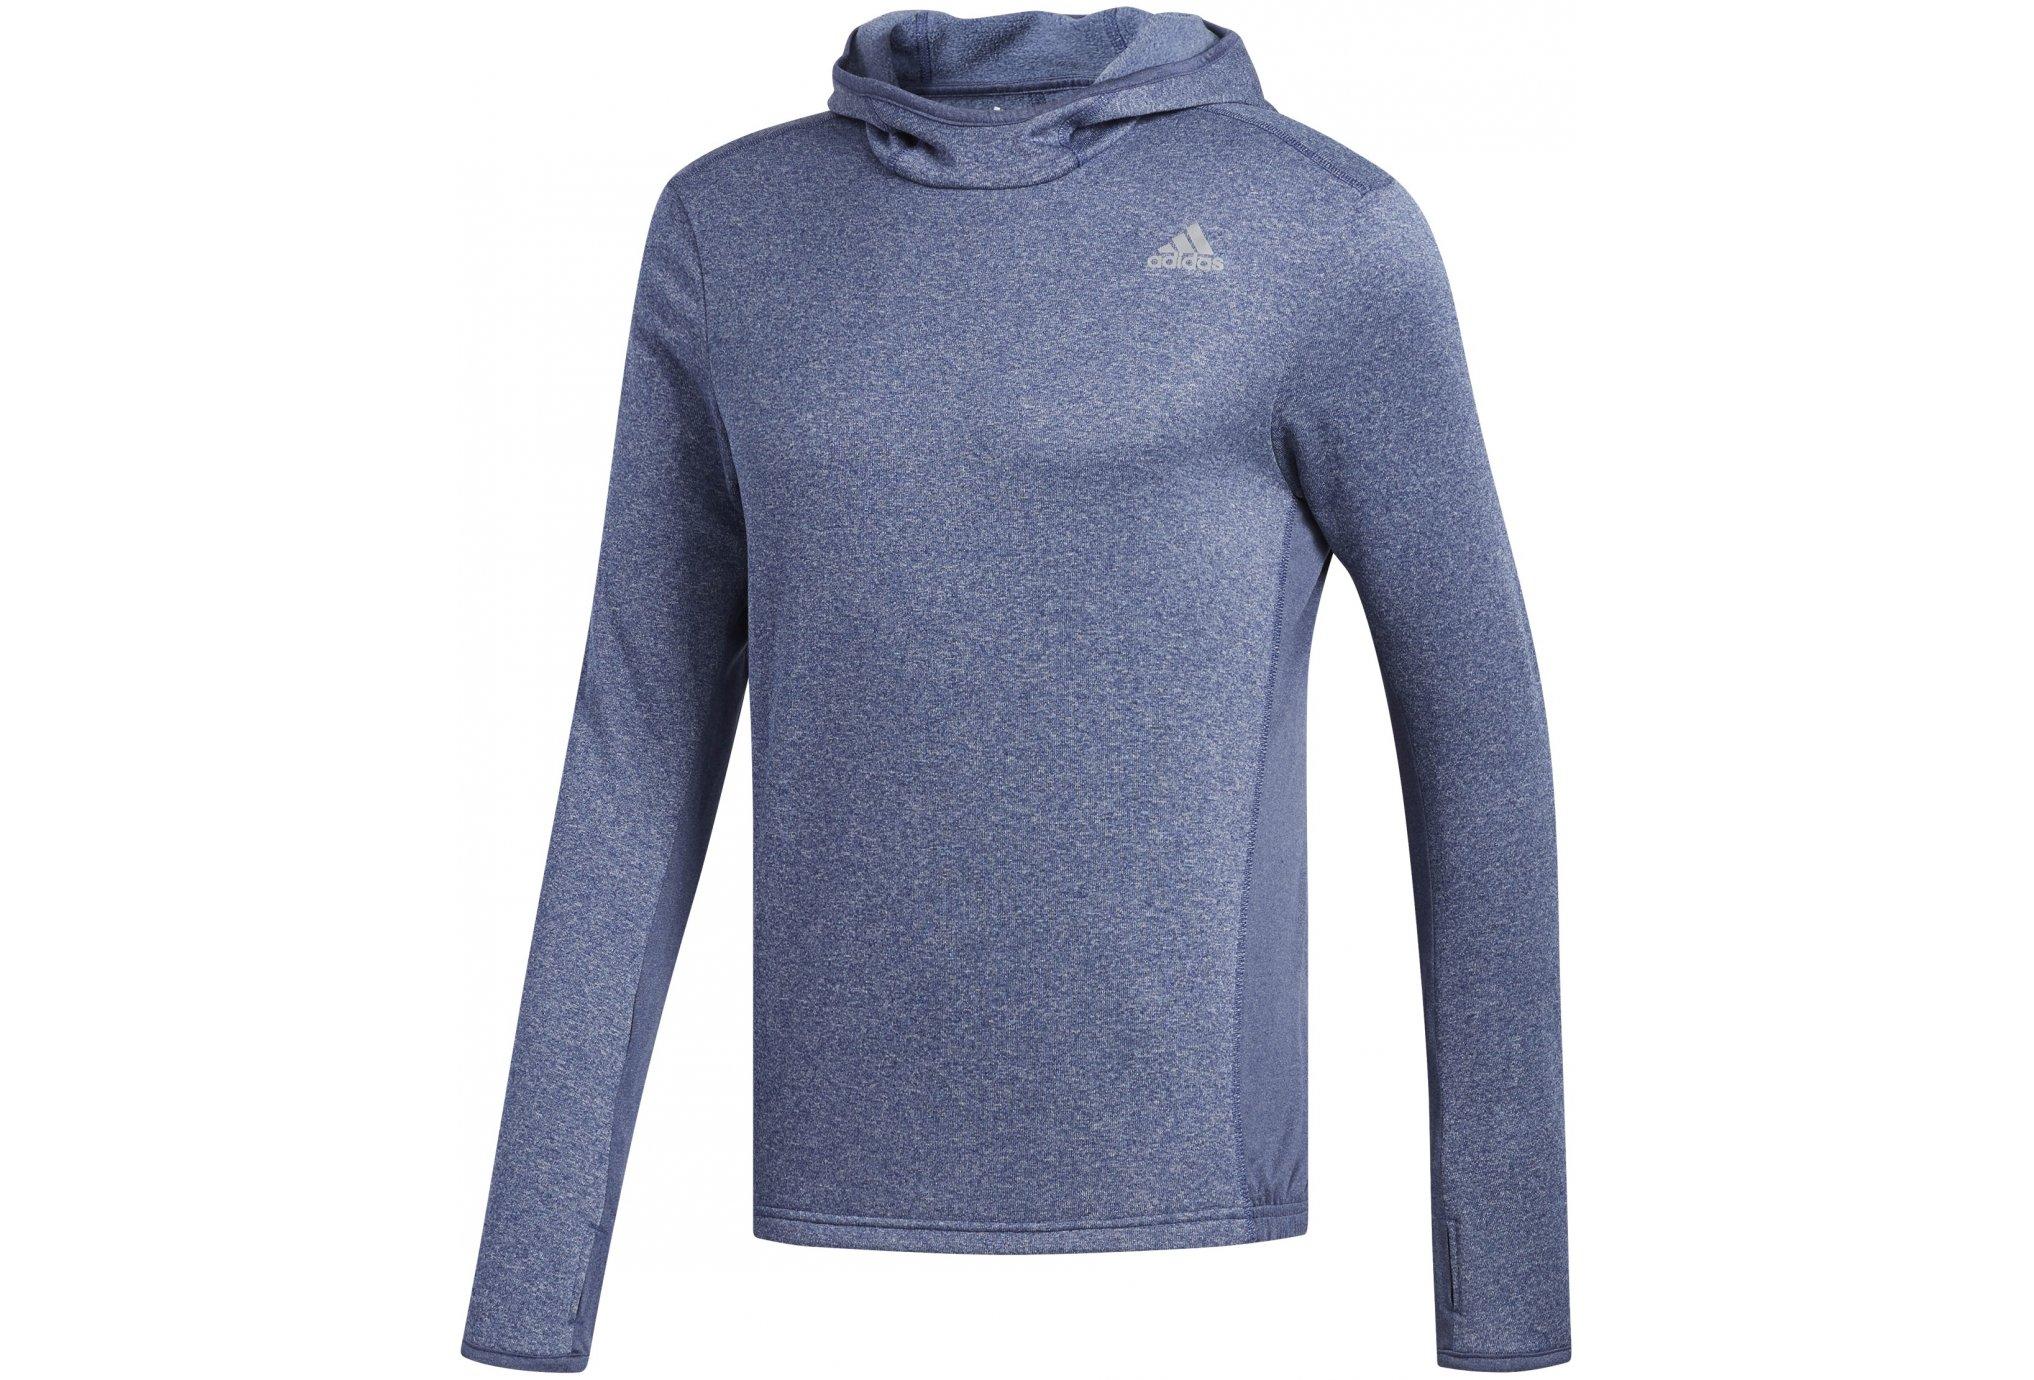 Adidas Response astro m vêtement running homme